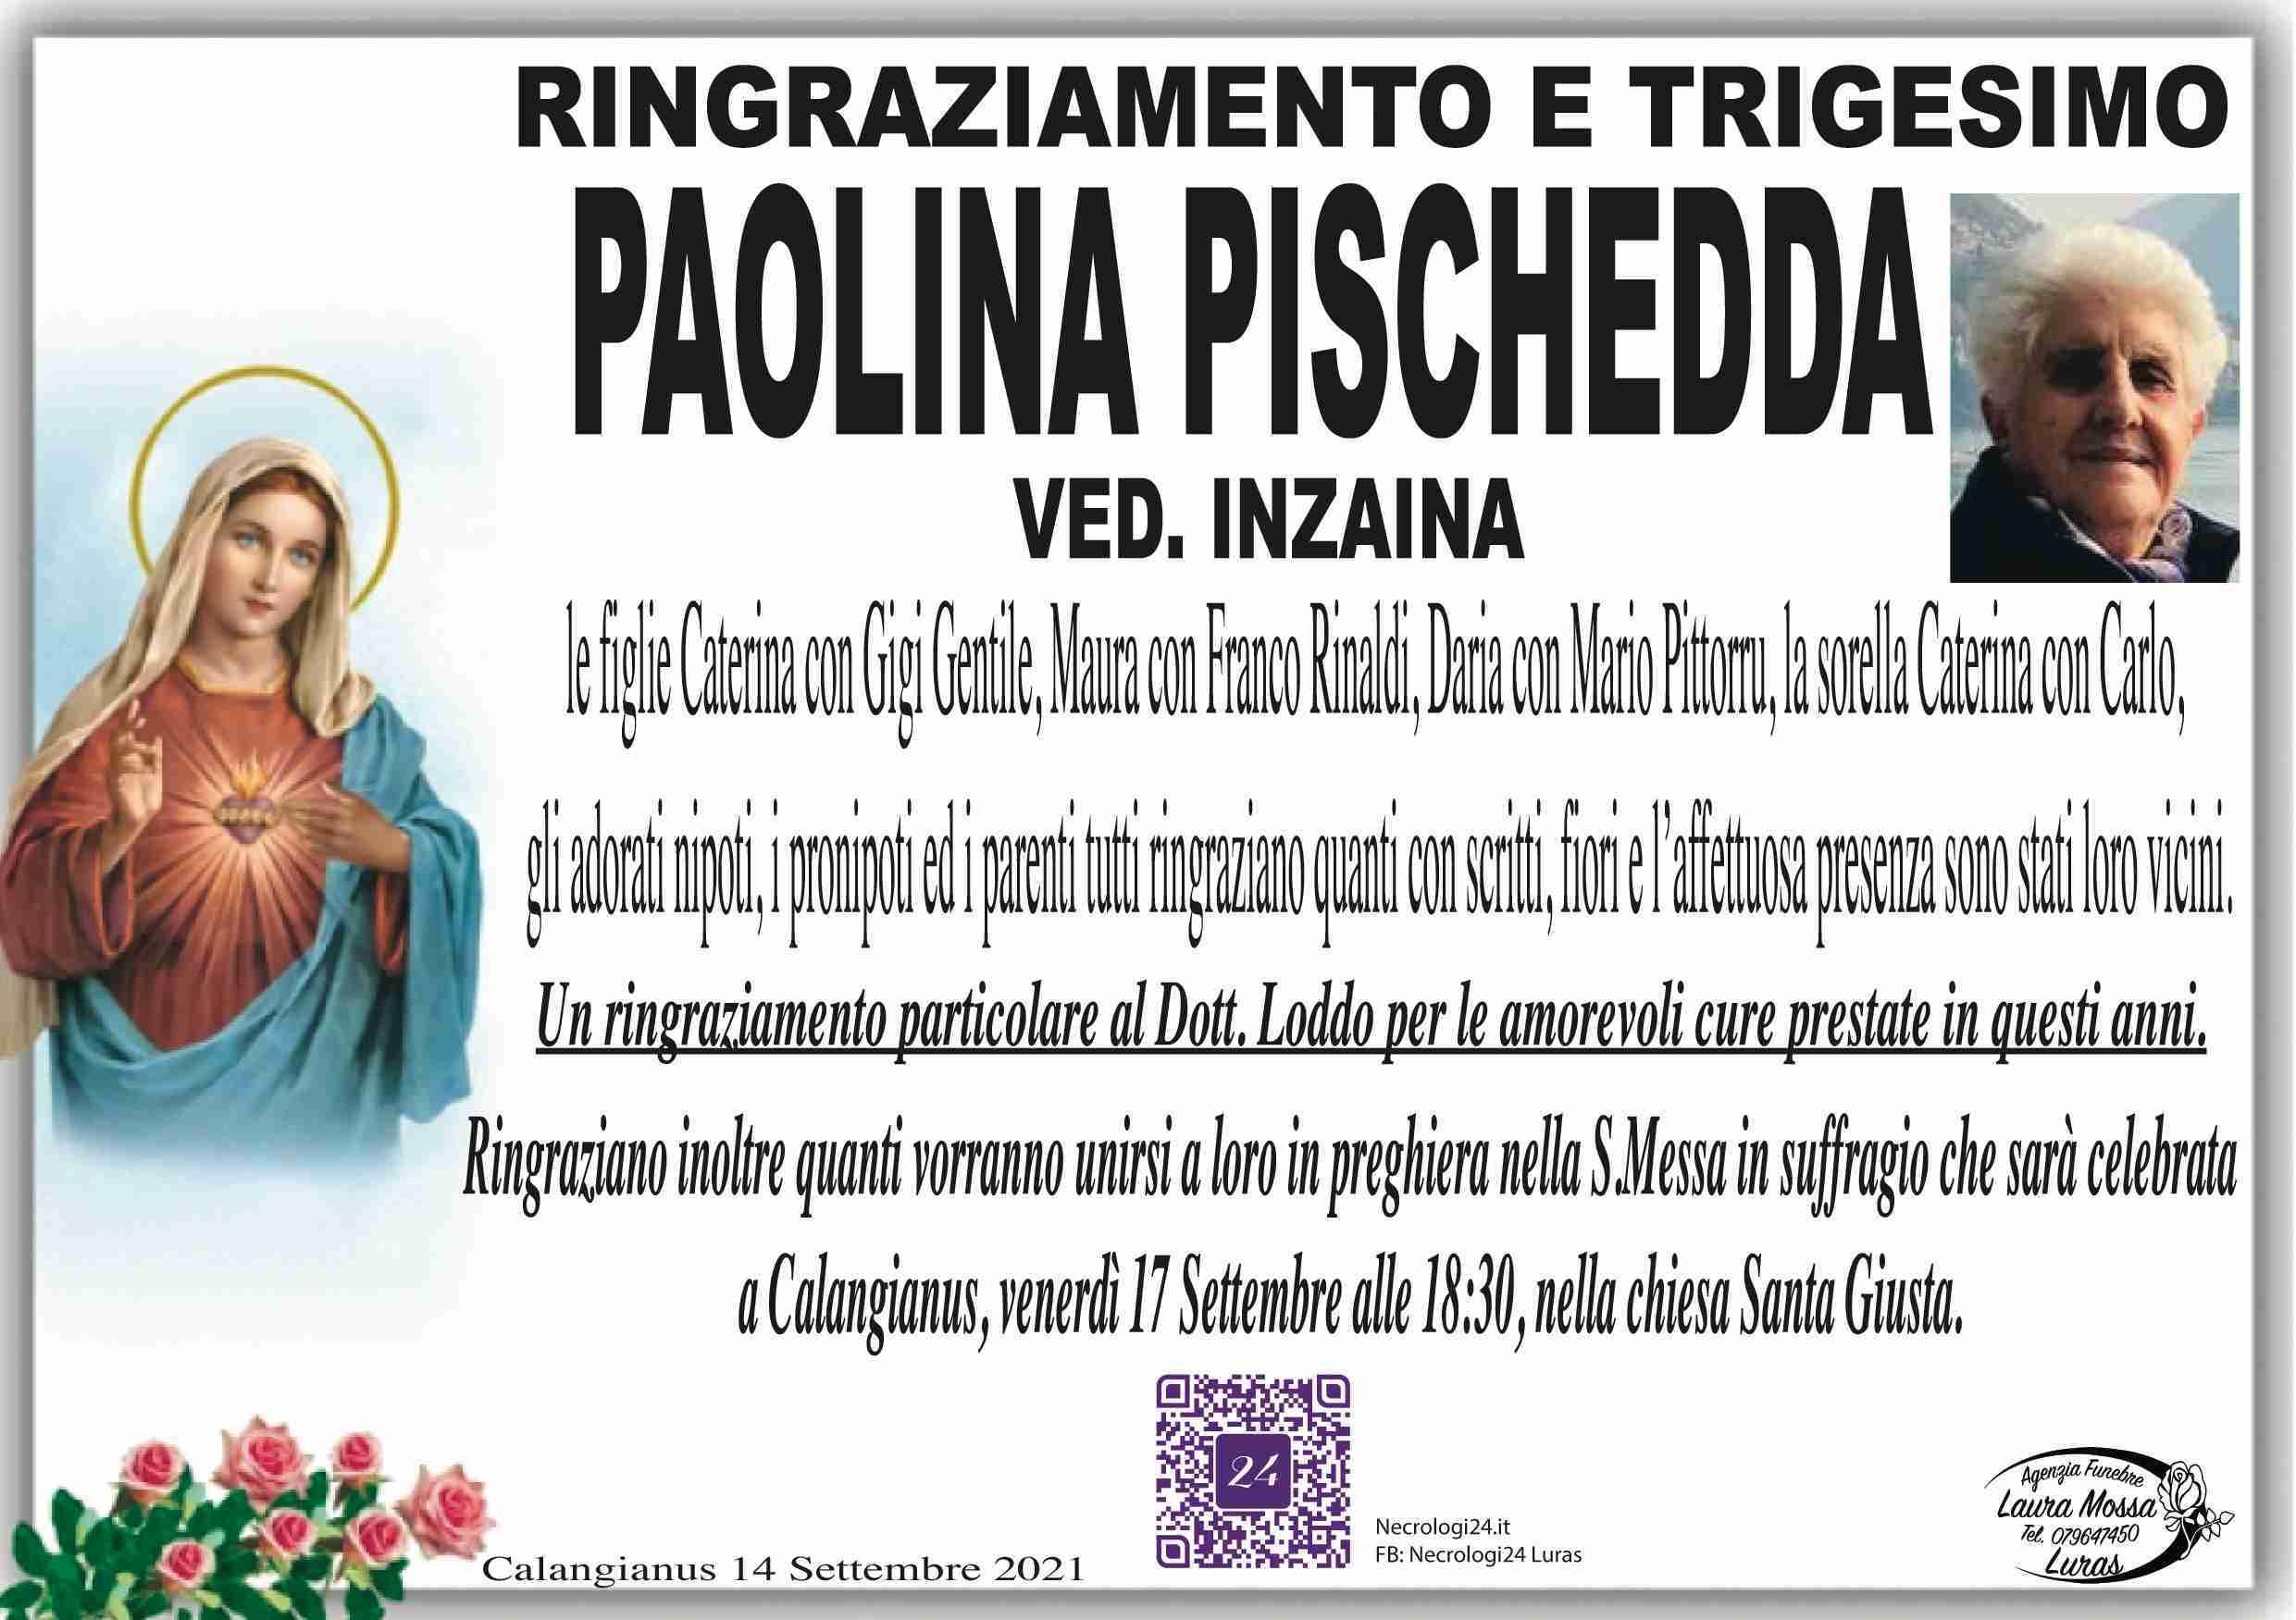 Paolina Pischedda